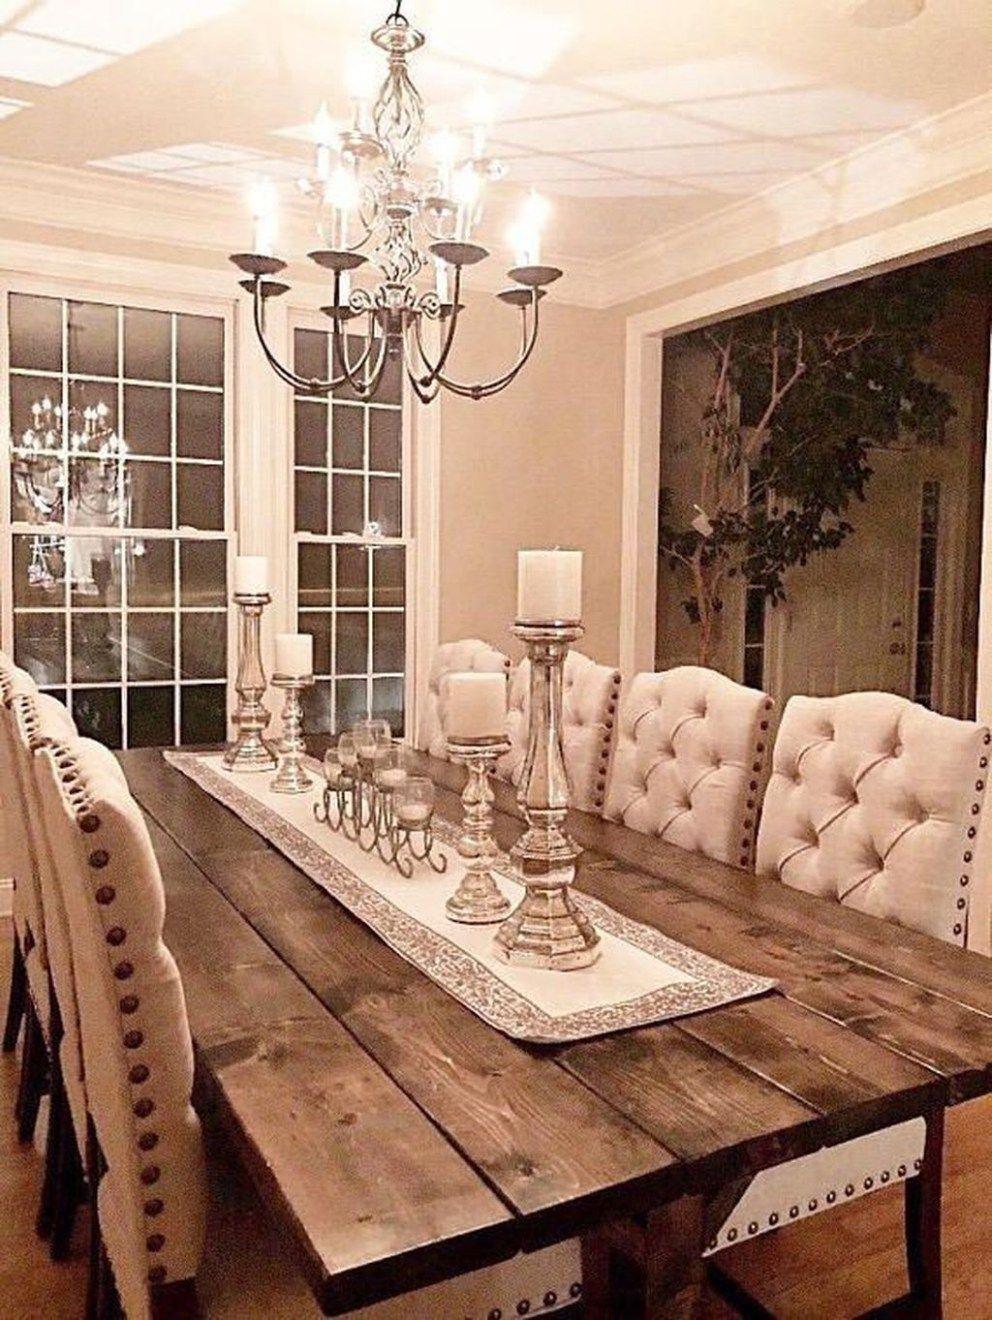 46 Popular Farmhouse Dining Room Design Ideas Trend 2019: Rustic Farmhouse Living Room Decor Ideas 44